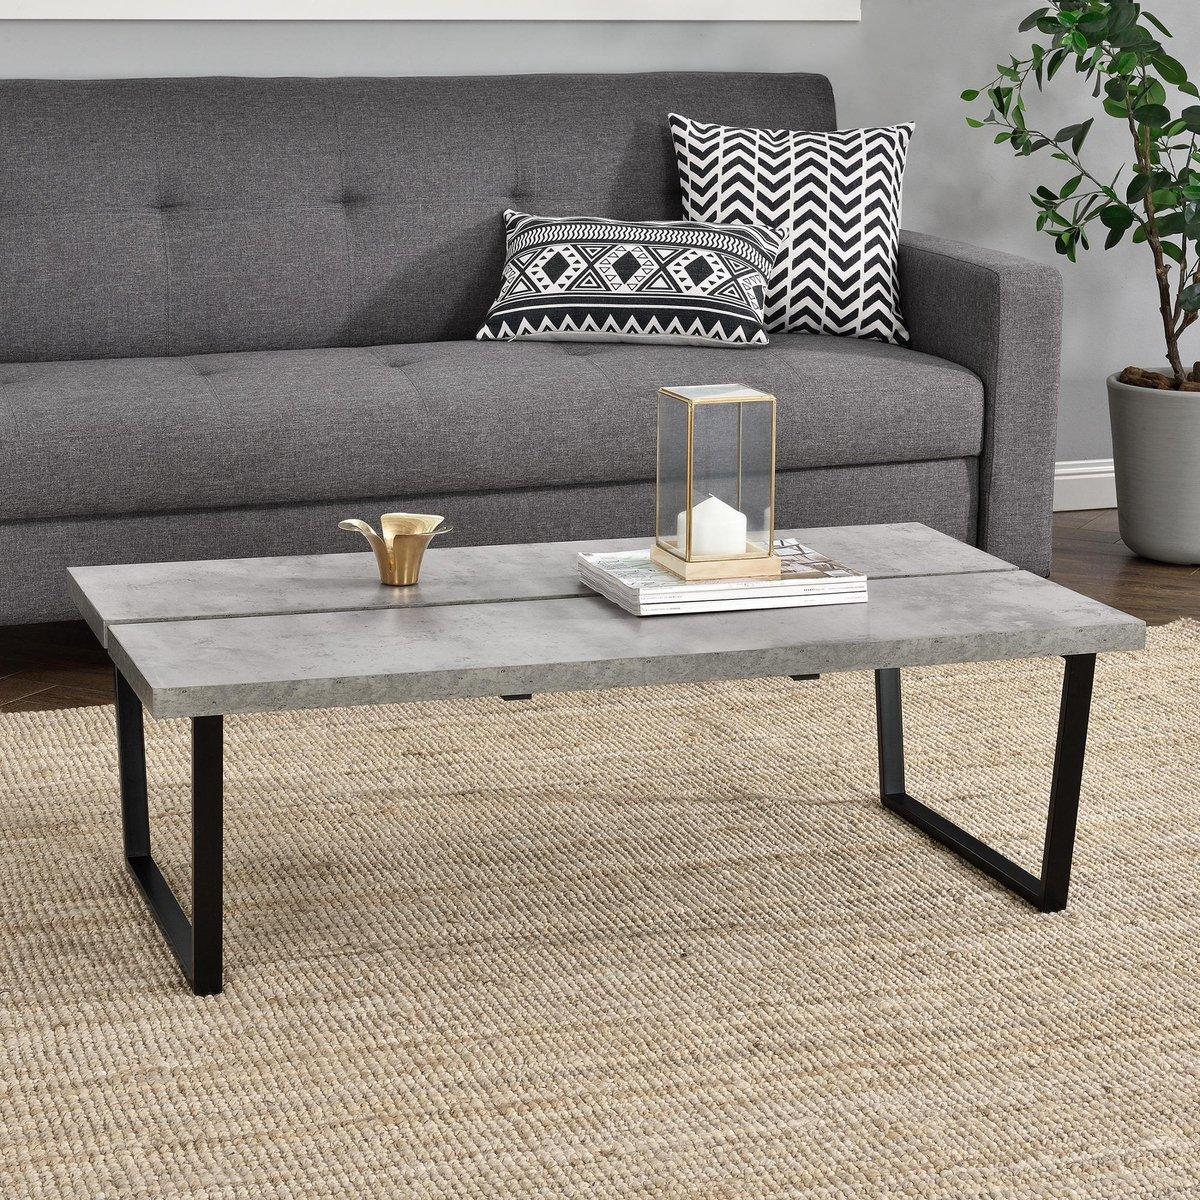 en.casa® Bradford Moderne Salontafel - Betonlook - Metalen frame - en.casa